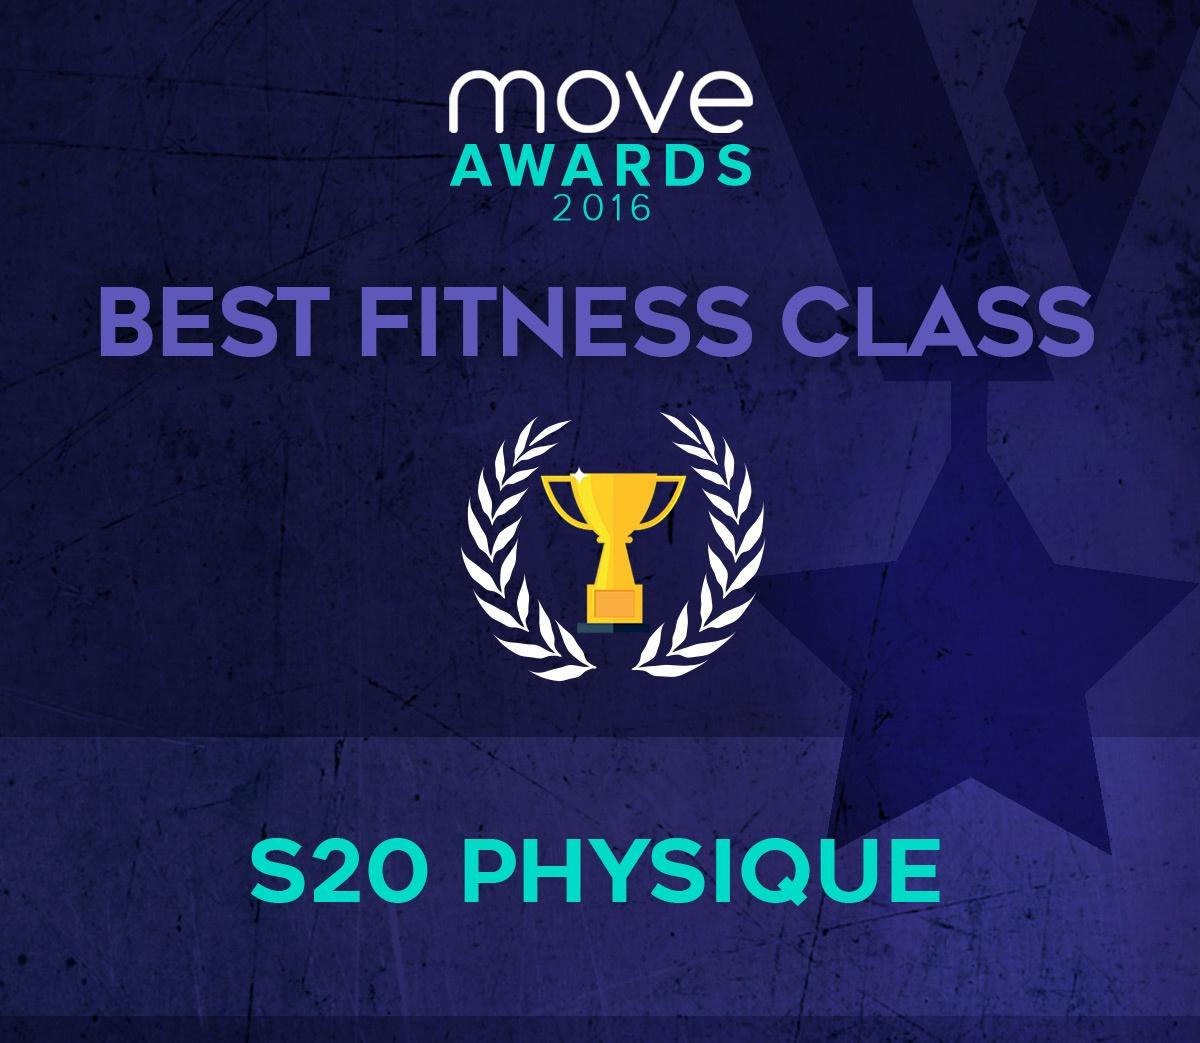 Best-Fitness-Class-Sheffield.jpg